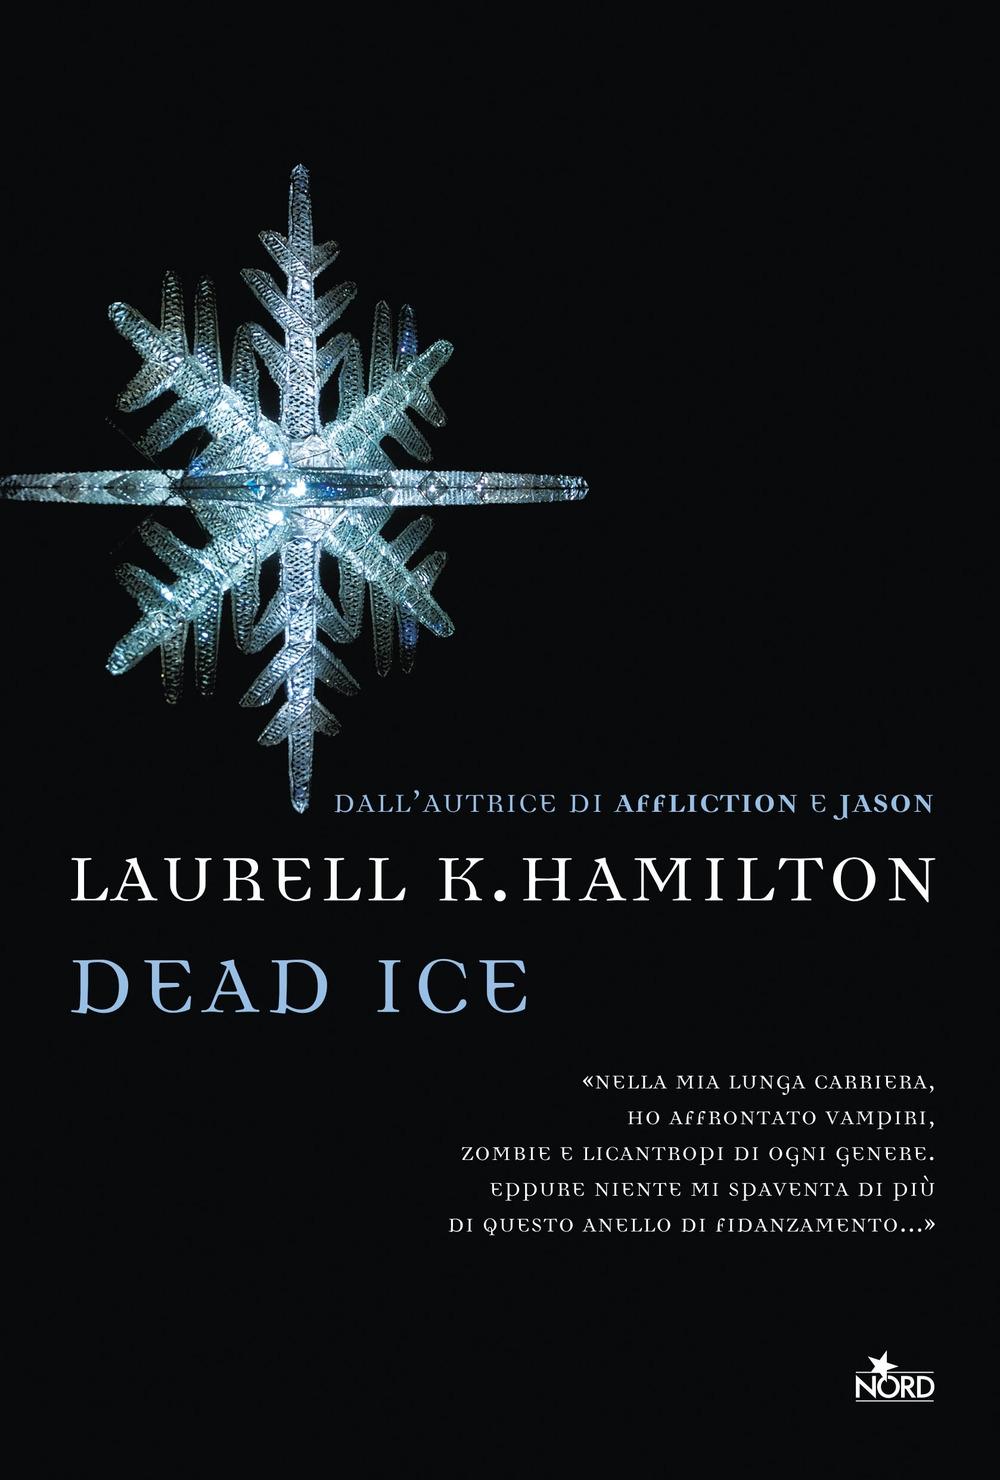 Dead ice.